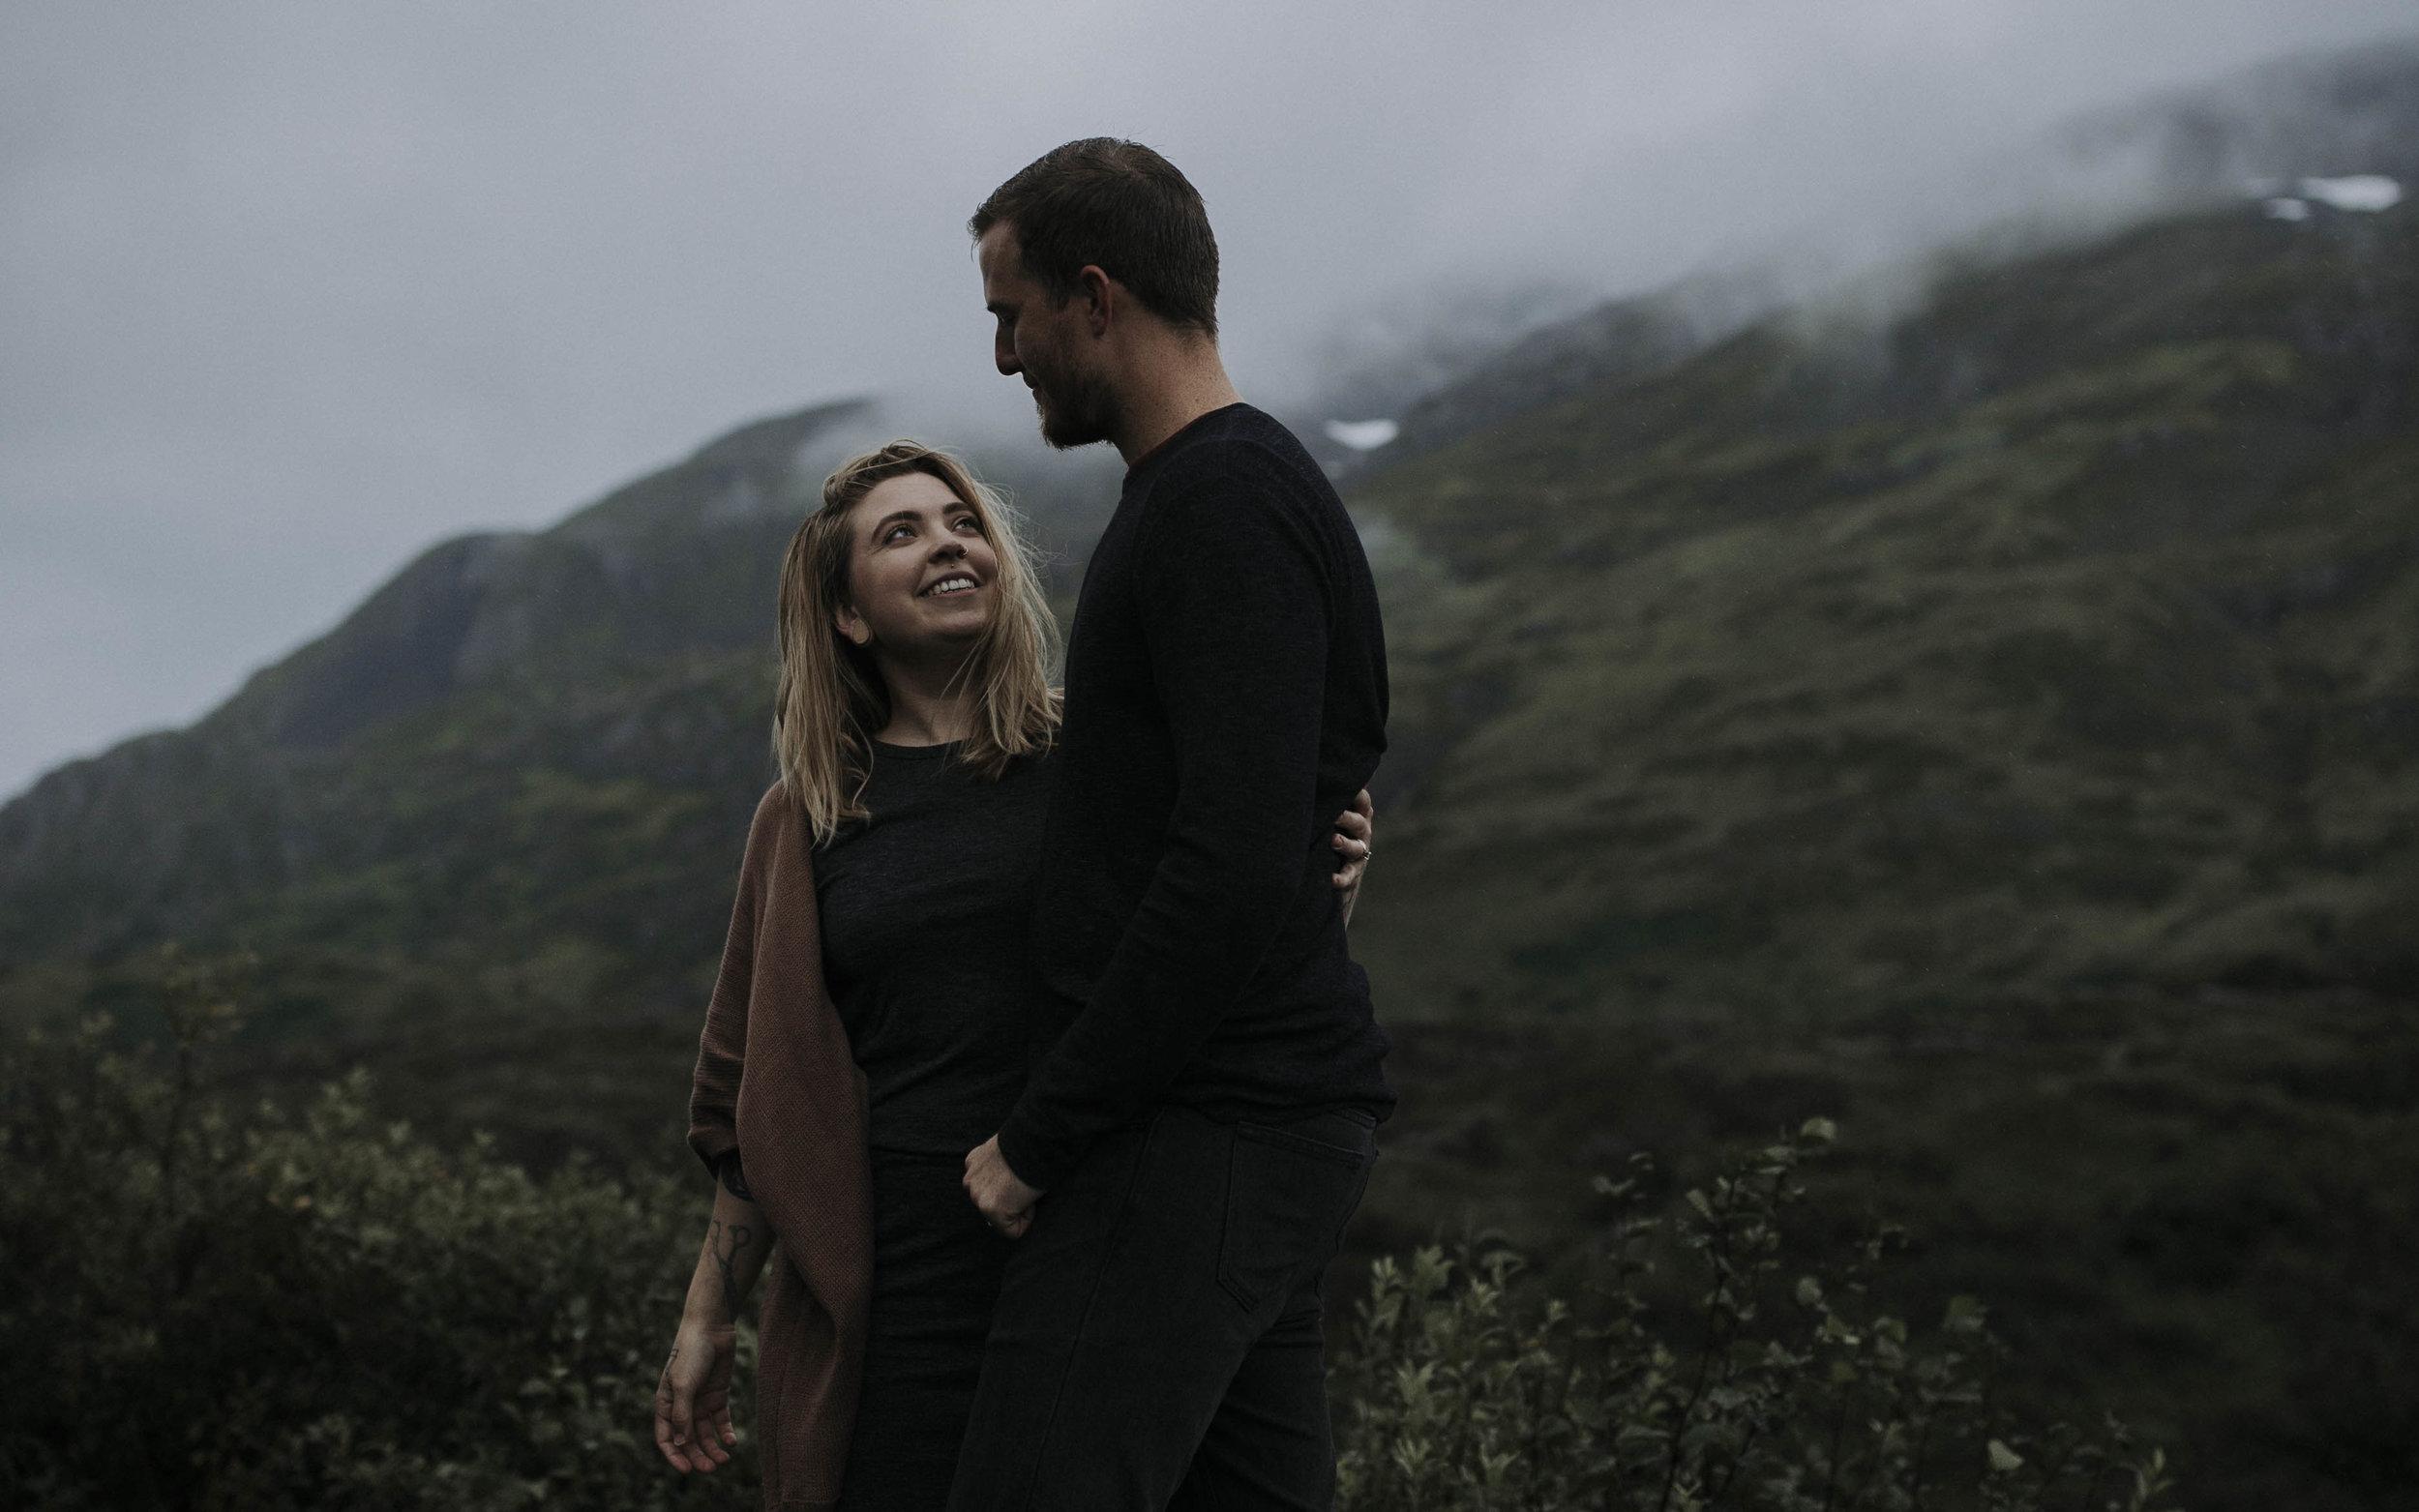 ariel-lynn-alaskan-mountain-couples-session-8.jpg